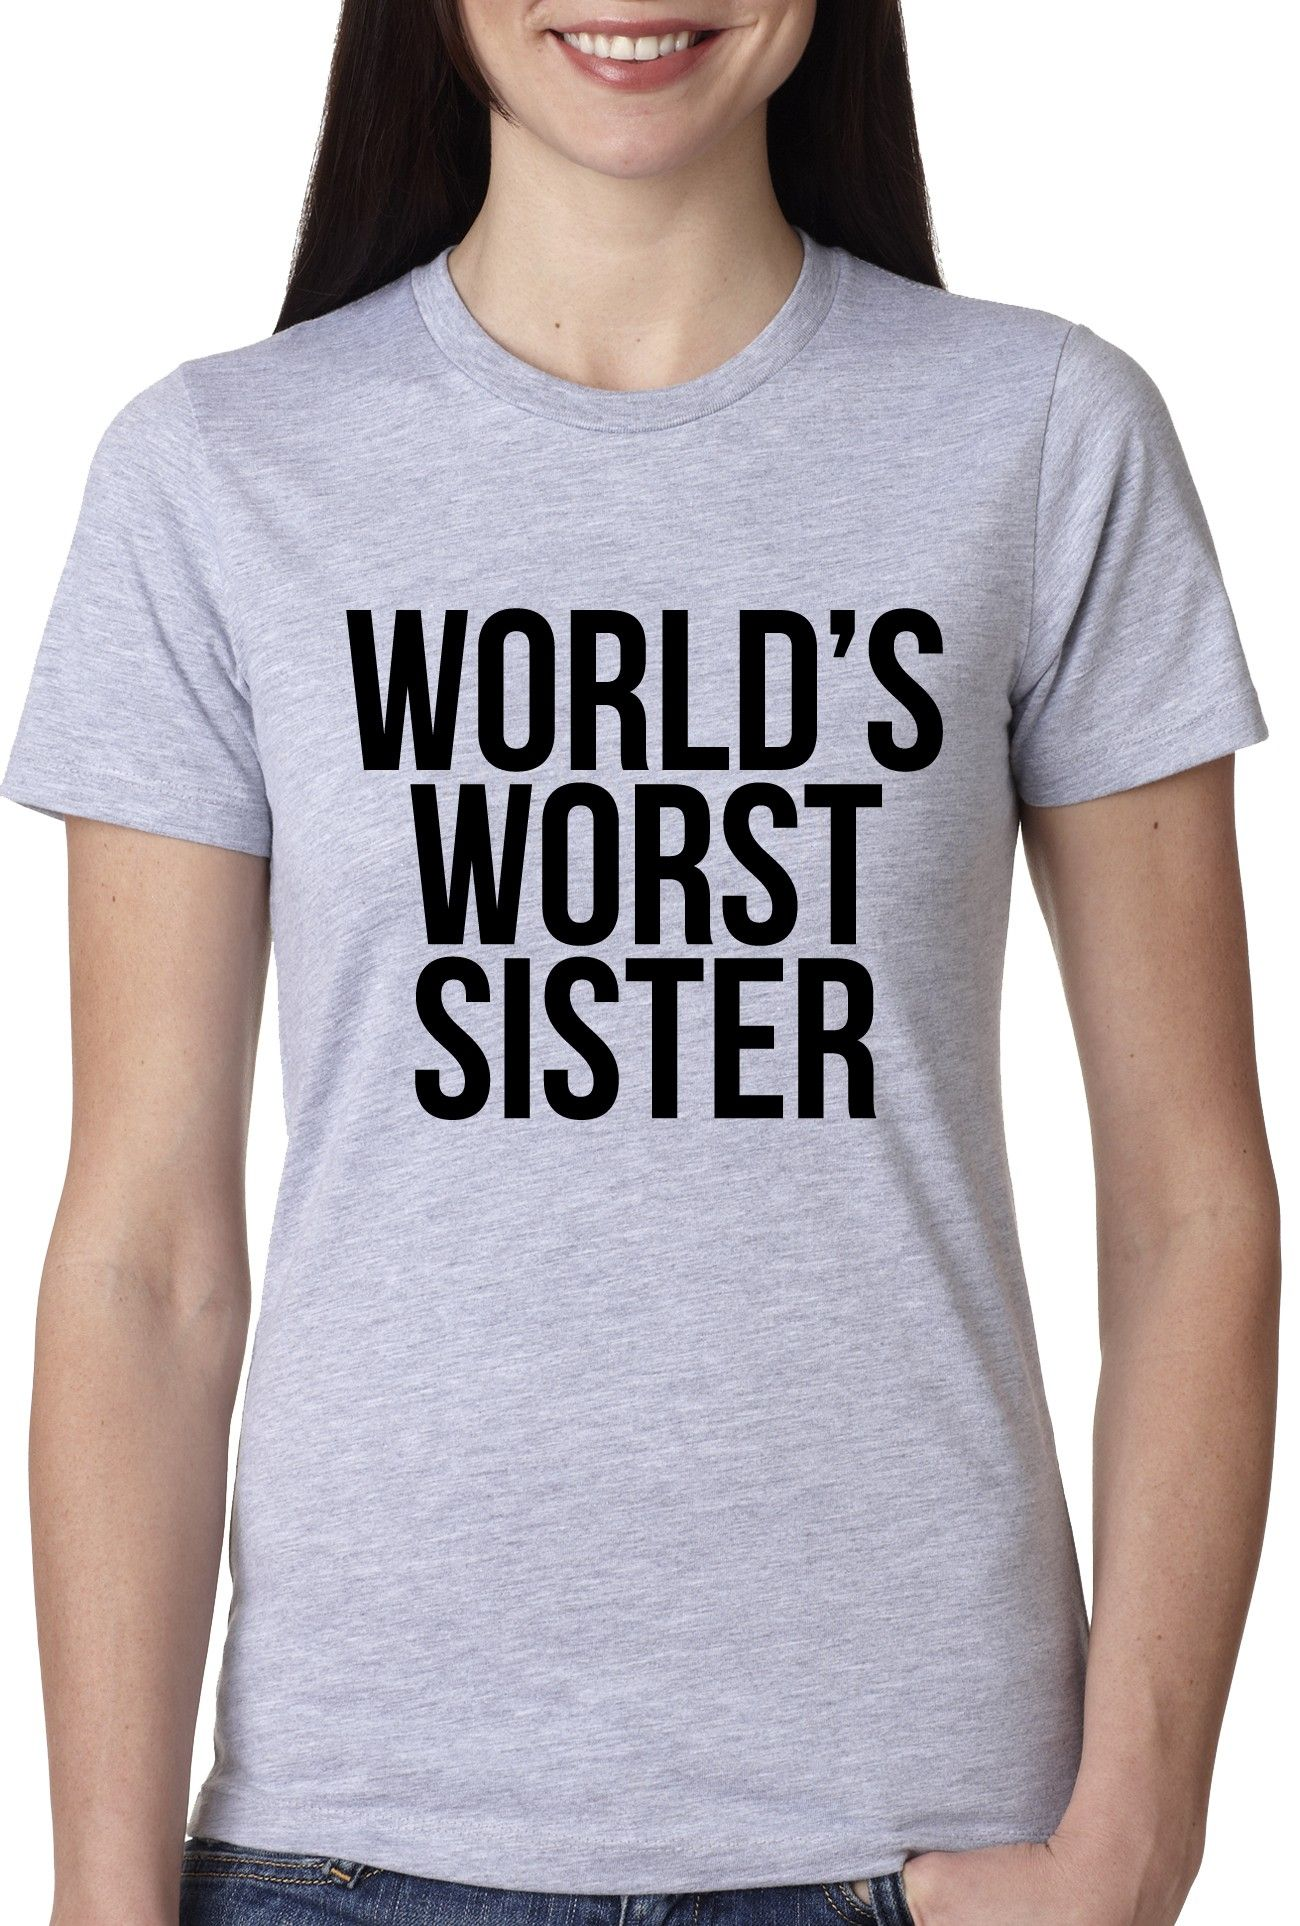 bc0a4ff5 Worst Sister Ever, Ladies t-shirt | CrazyDog Tshirts #CrazyDogTshirts  #WorldsWorst #Funny #TShirts